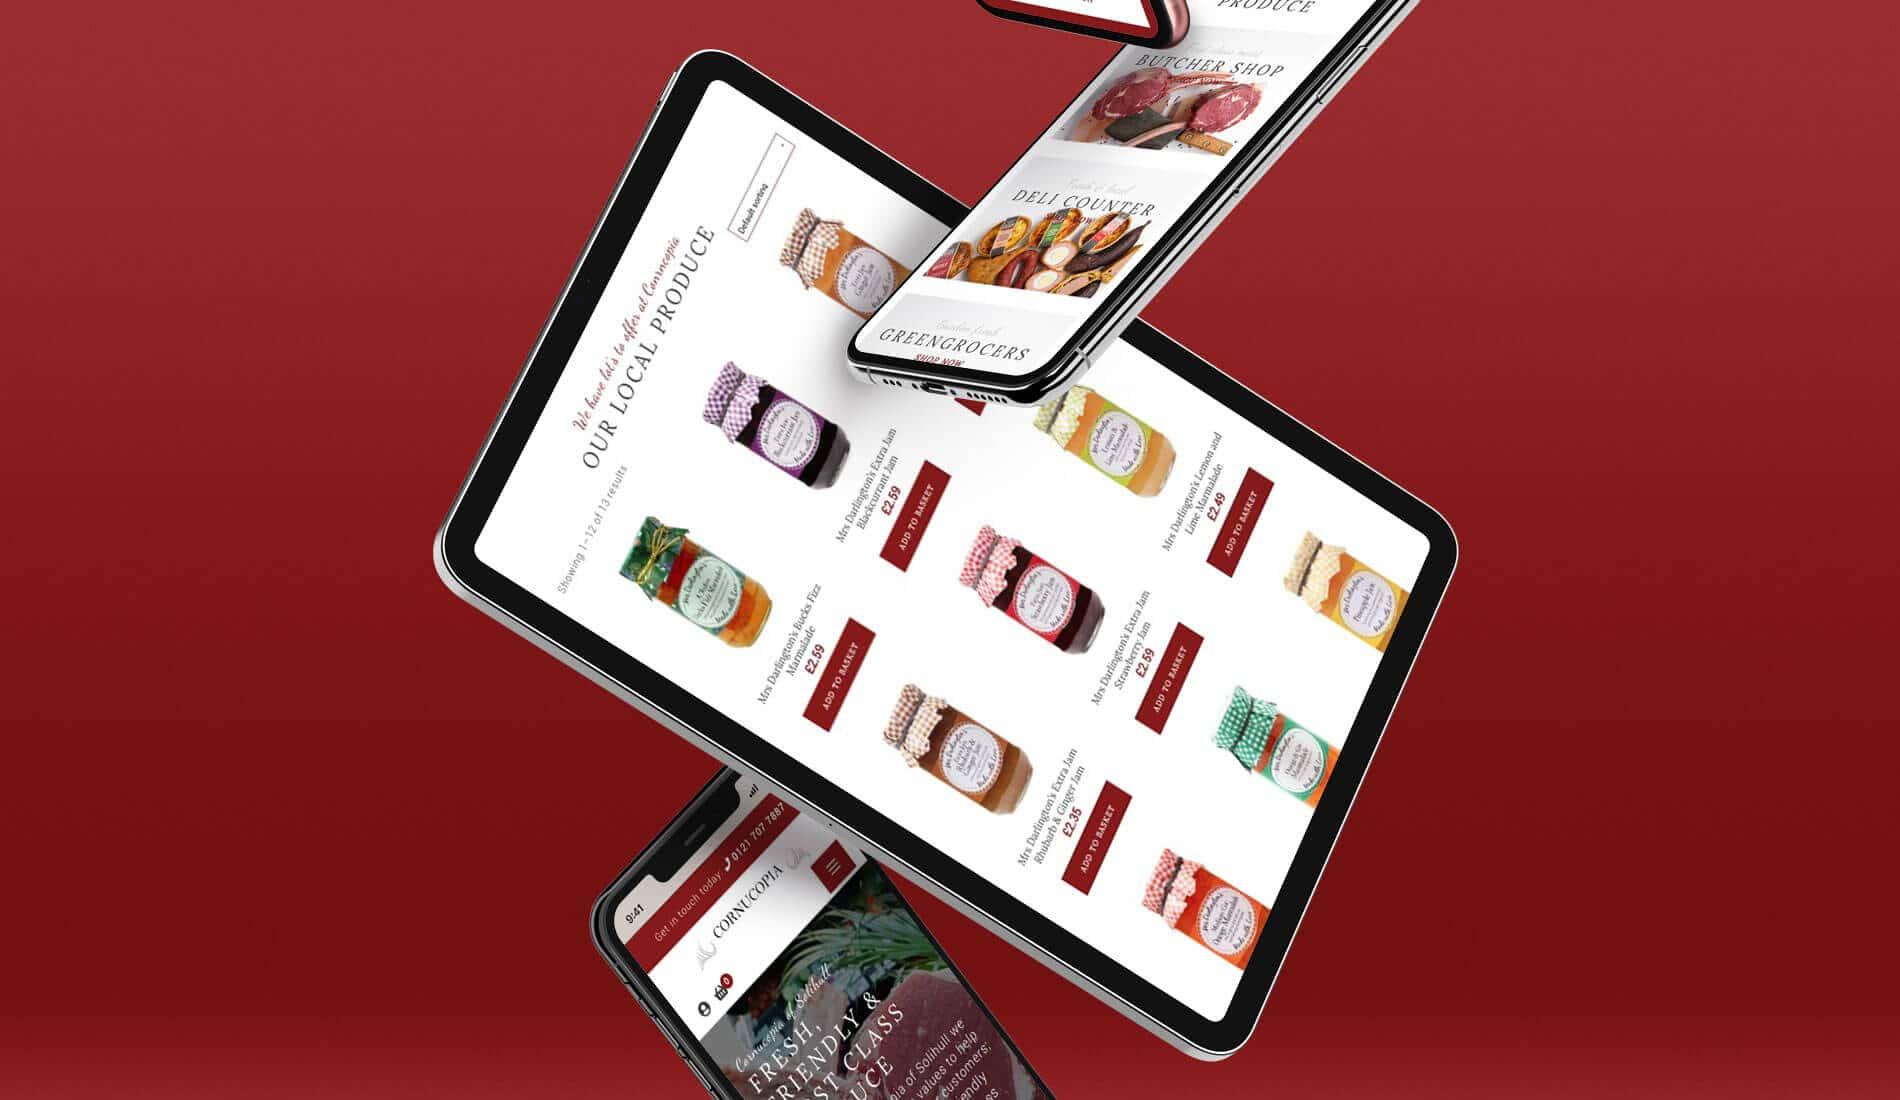 Cornucopia website on various devices